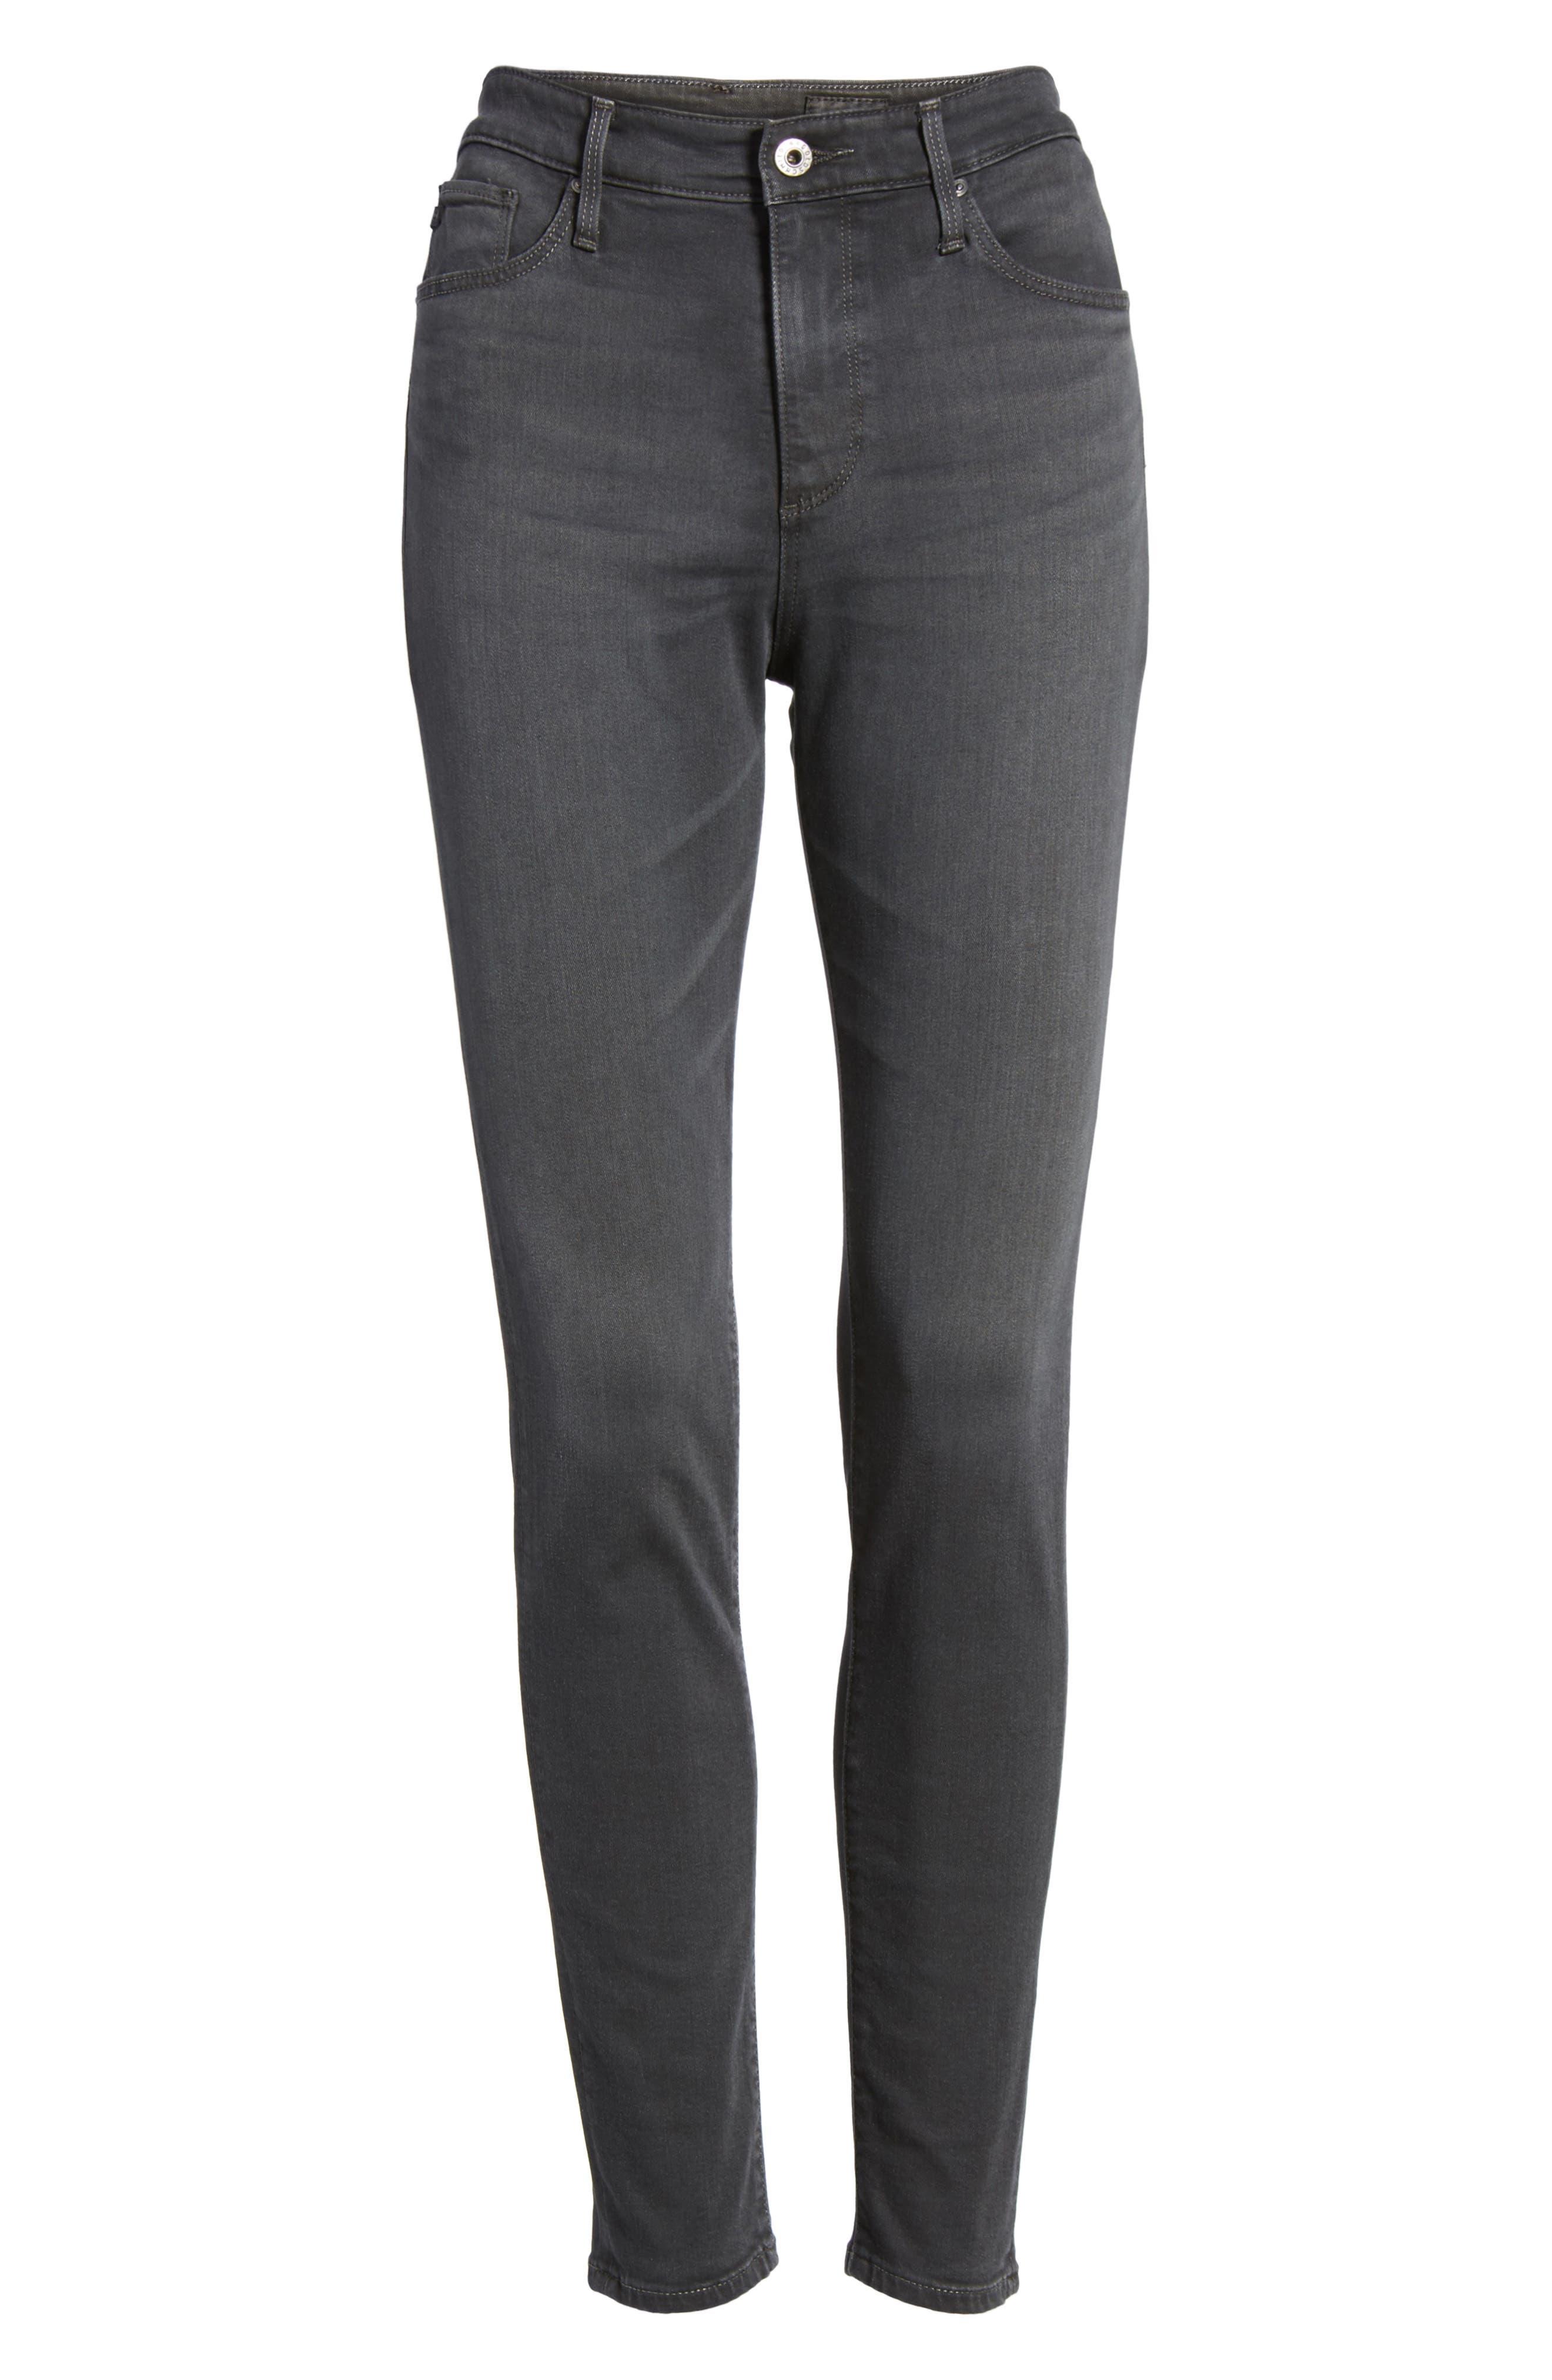 Farrah High Waist Ankle Skinny Jeans,                             Alternate thumbnail 13, color,